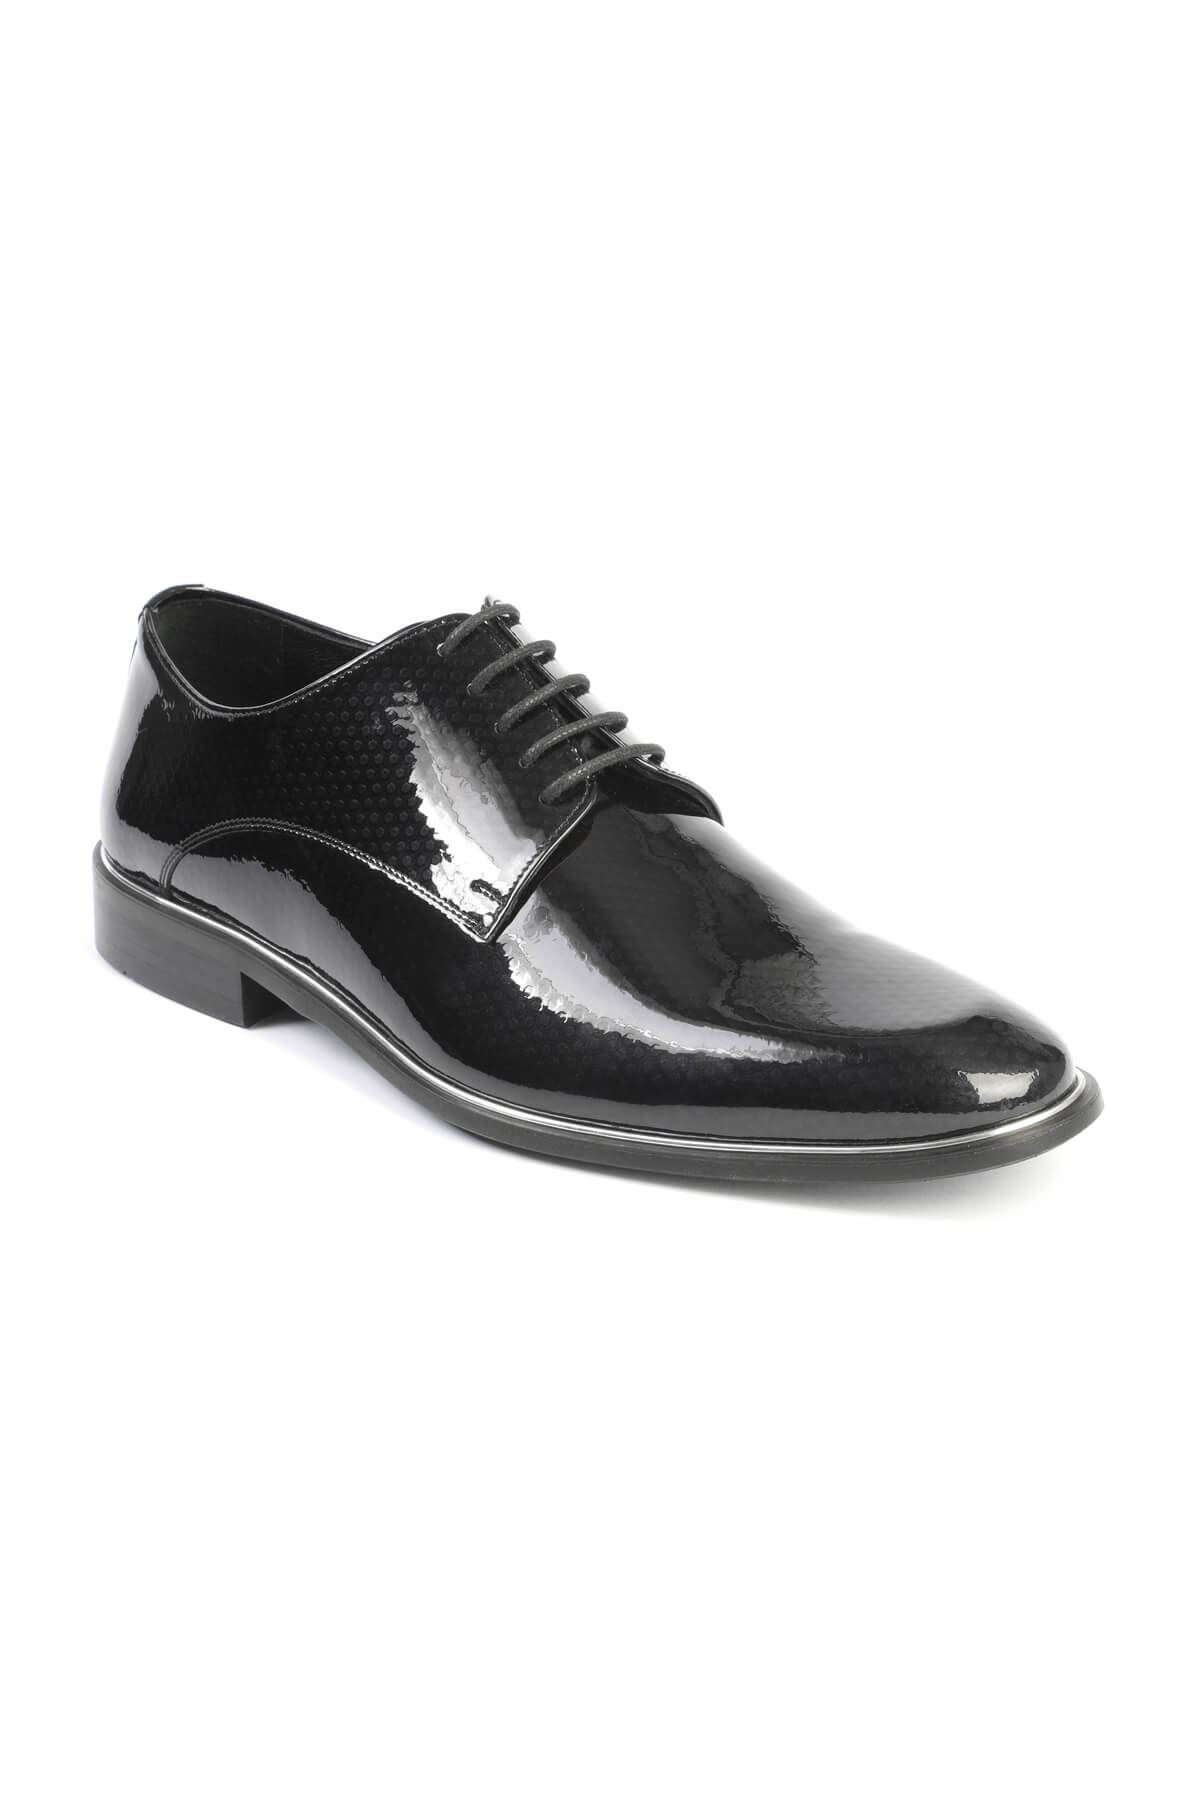 Libero 2140 Black Classic Shoes